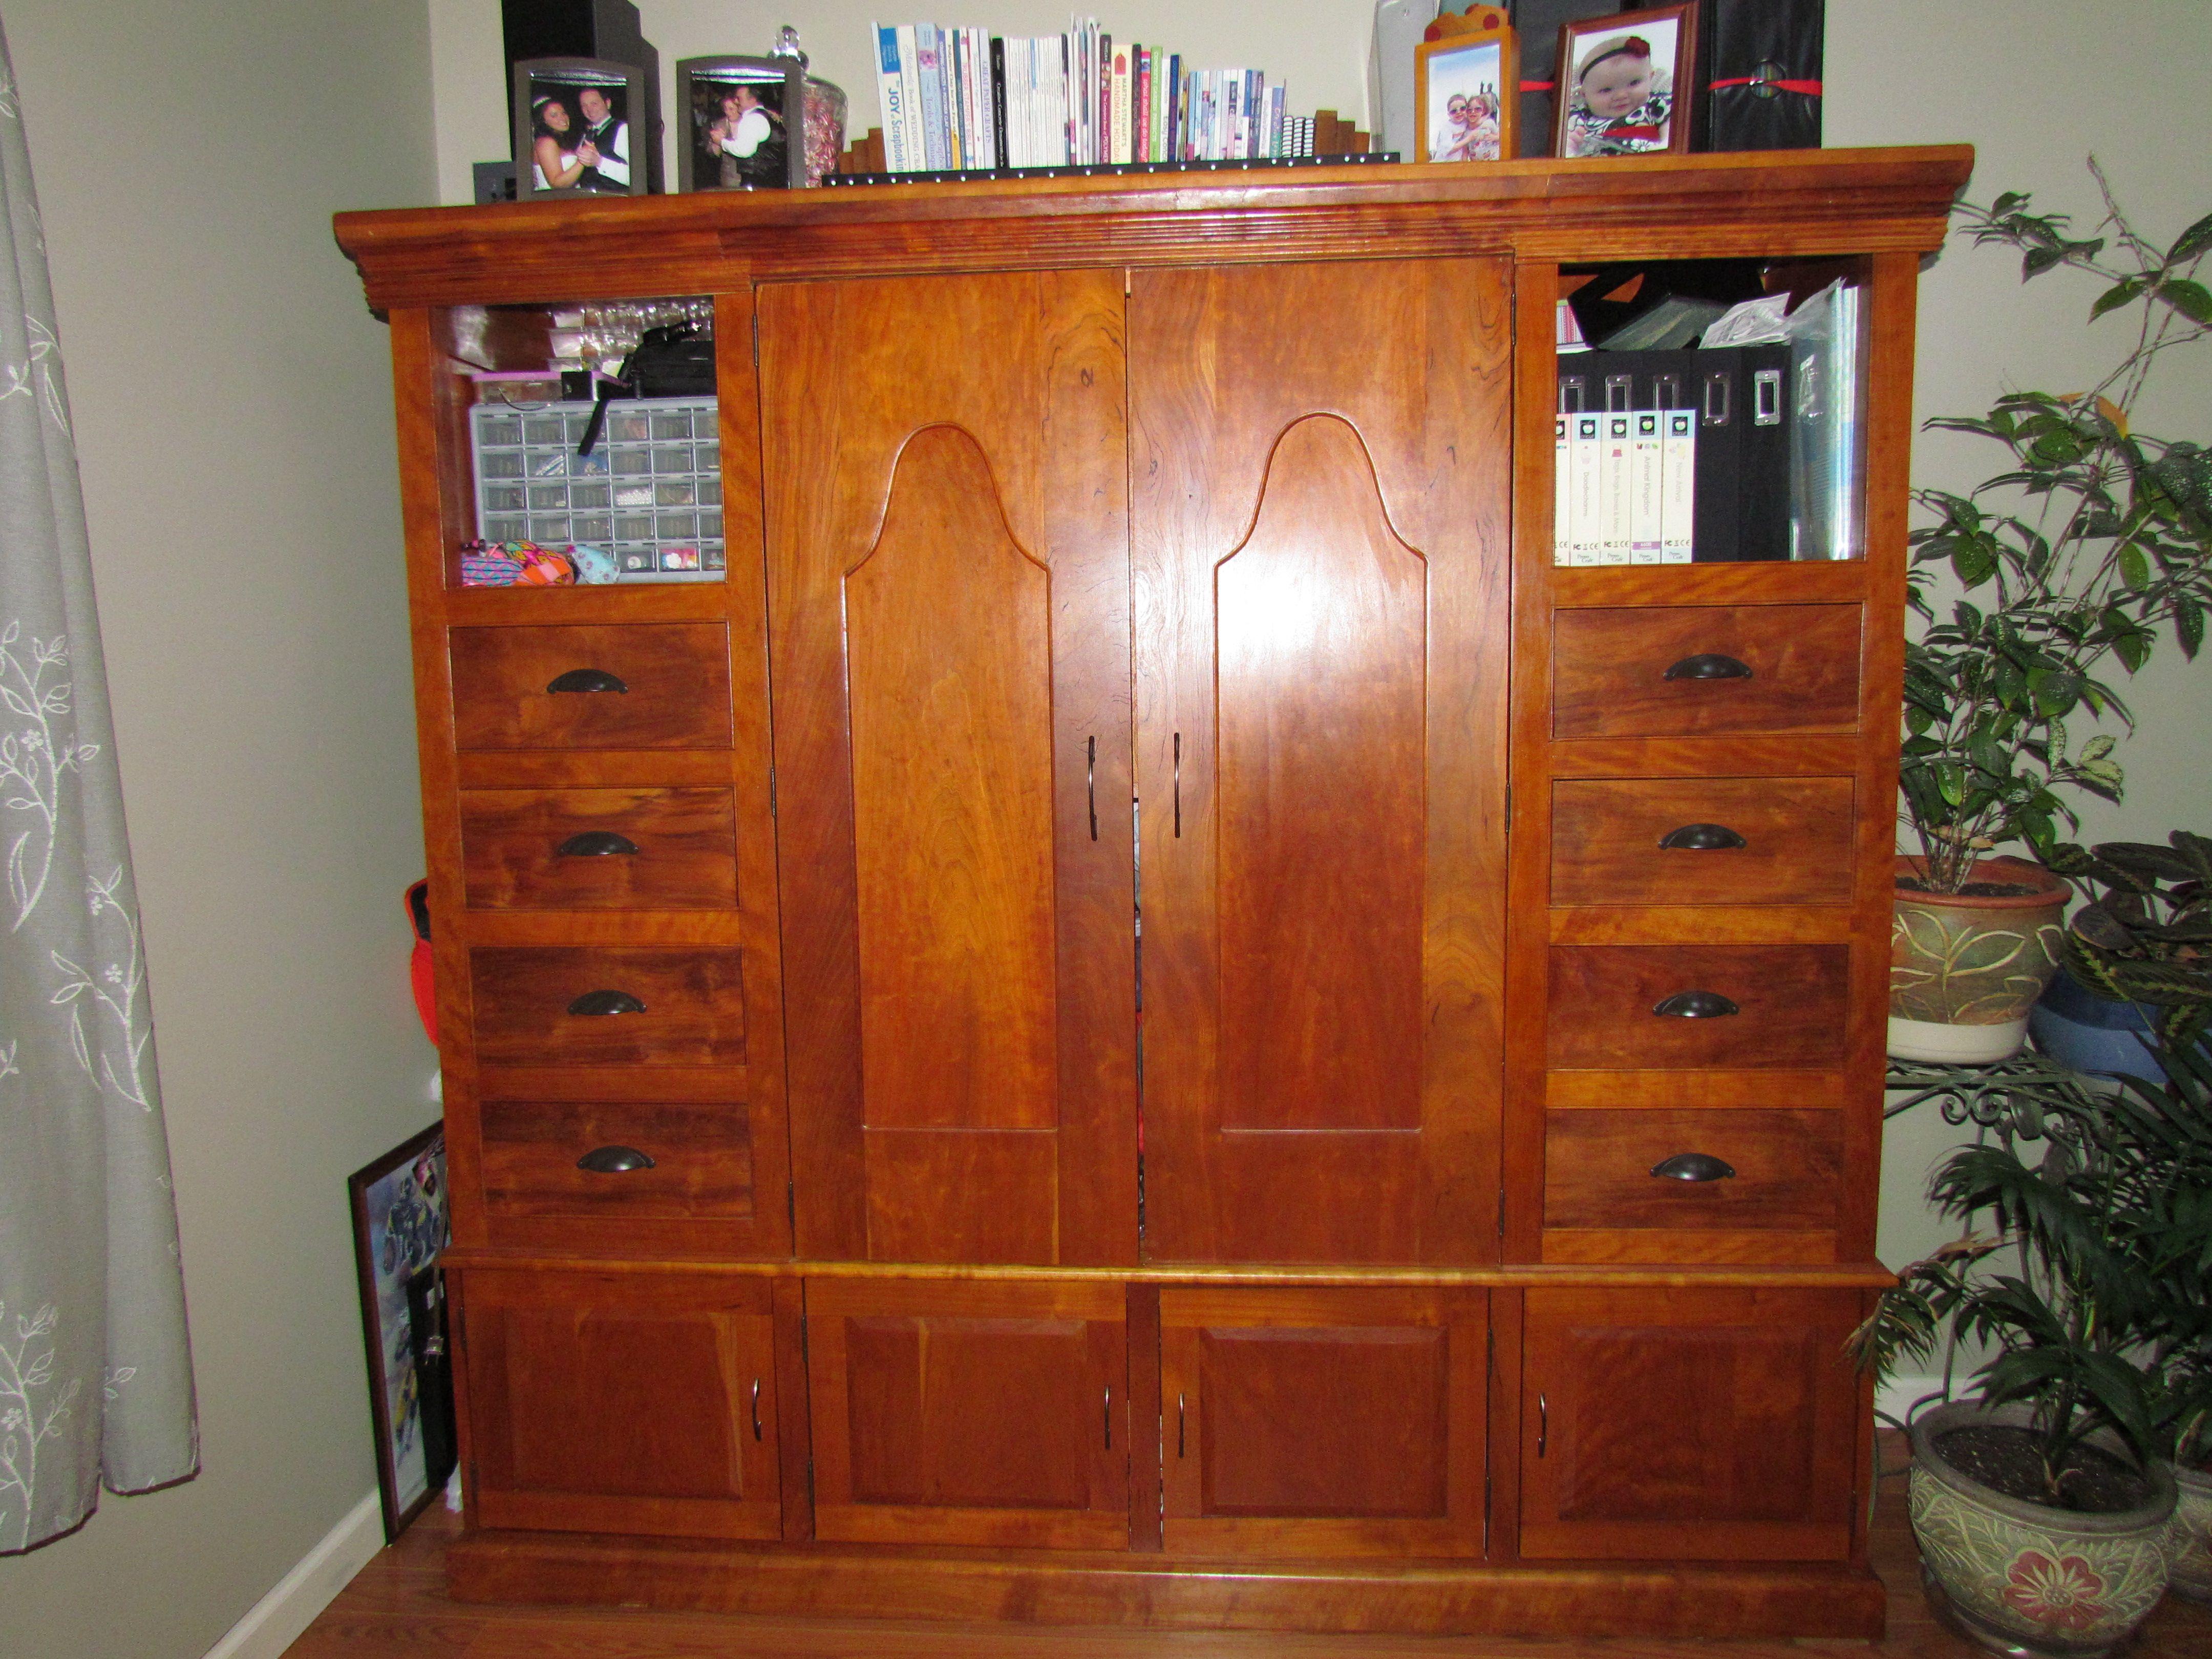 Scrapbook Cabinet | Home decor, Decor, Furniture